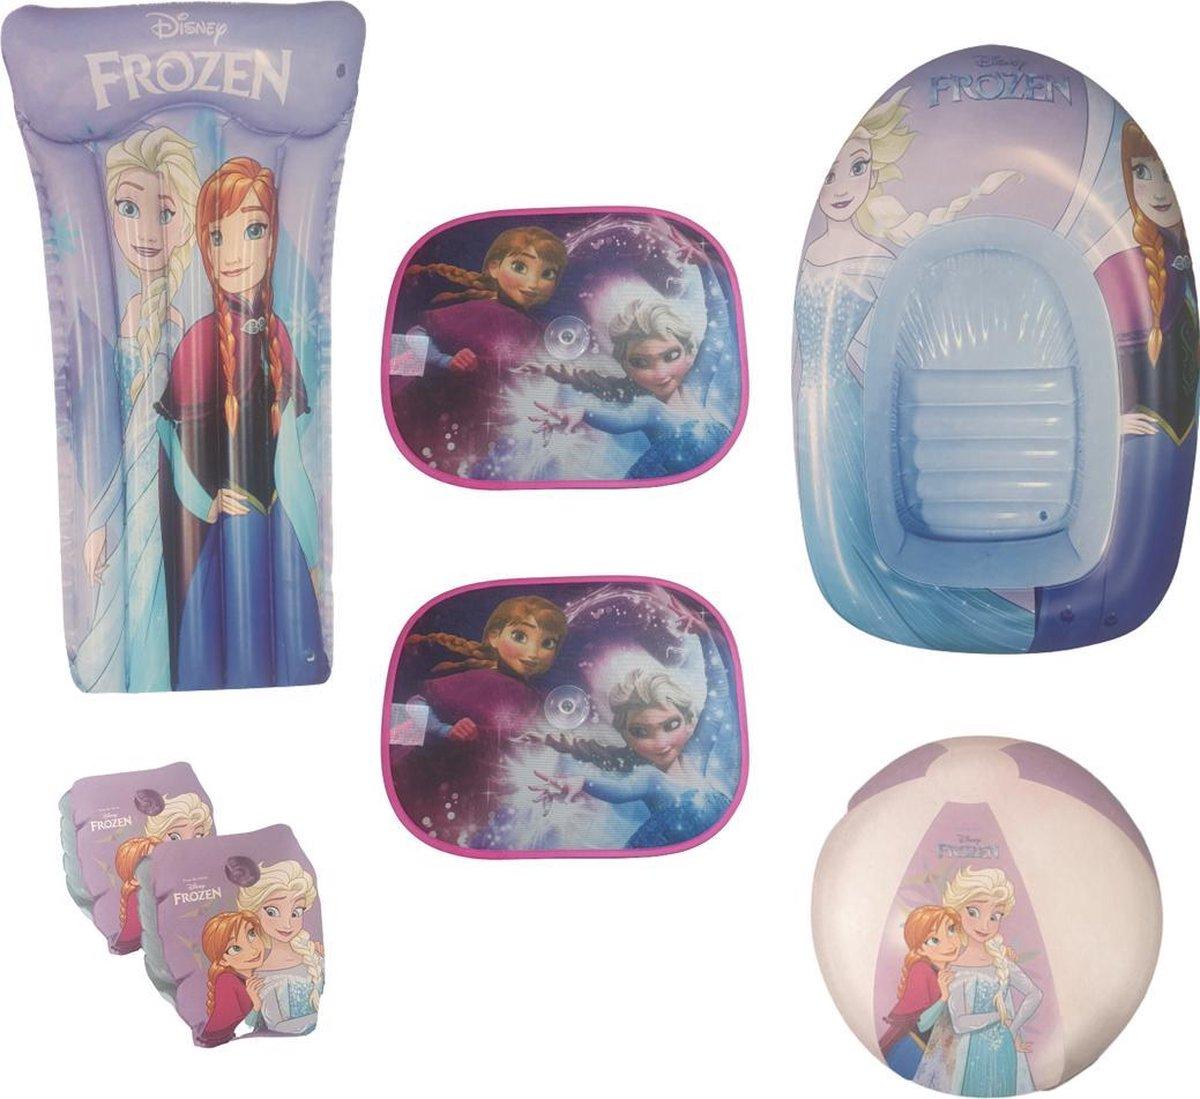 Frozen Zomerpakket | Funpakket | Zomerspeelgoed | Luchtmatras 119 x 61CM! | Zwembandjes | Strandbal | Opblaasboot 102 x 69CM! |2x Zonnescherm | 5-in-1 | Waterpret | Meisjes | Girls